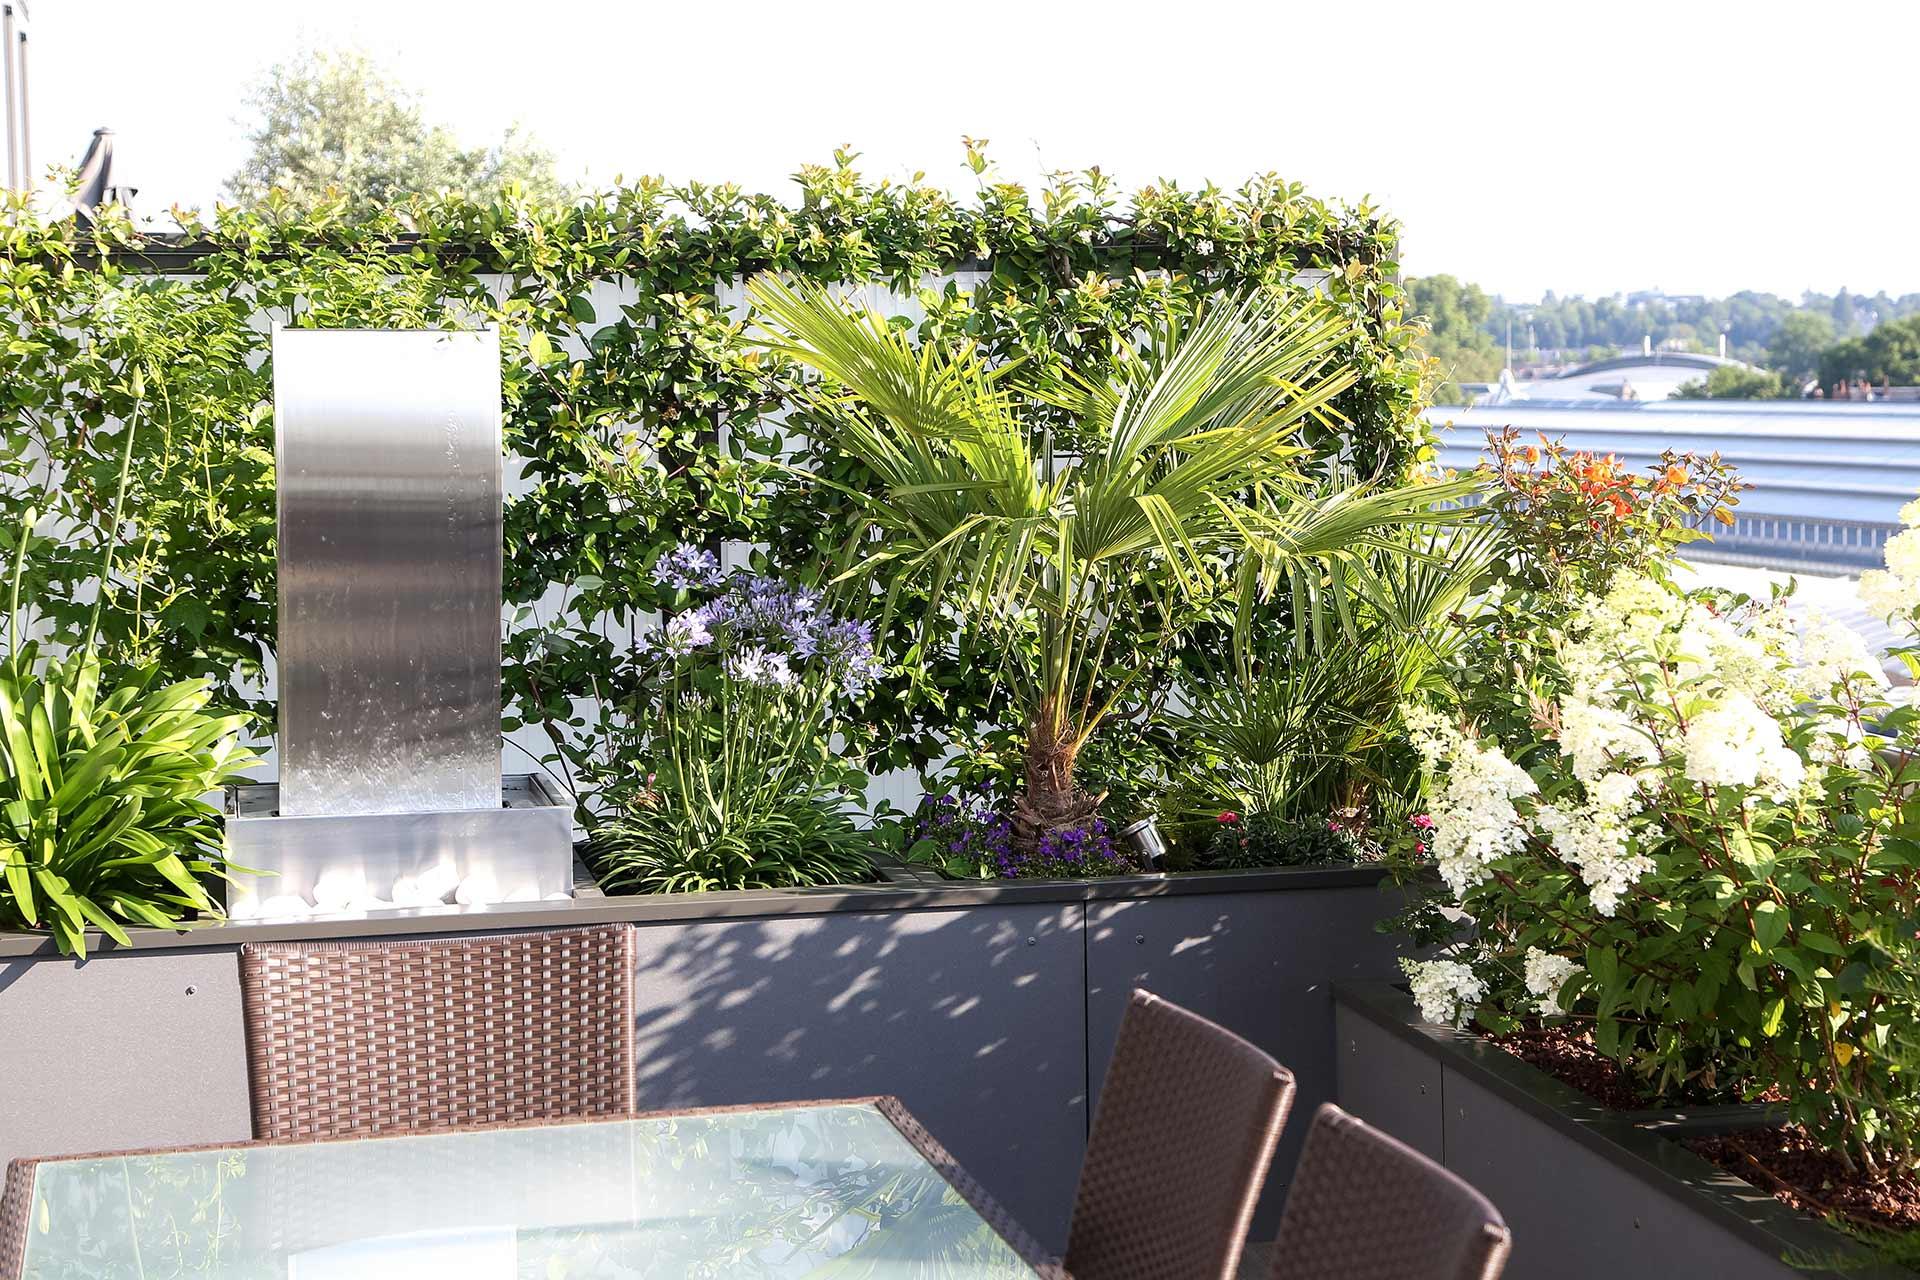 Entreprise du paysage, Serrault Jardins crée vos terrasses.